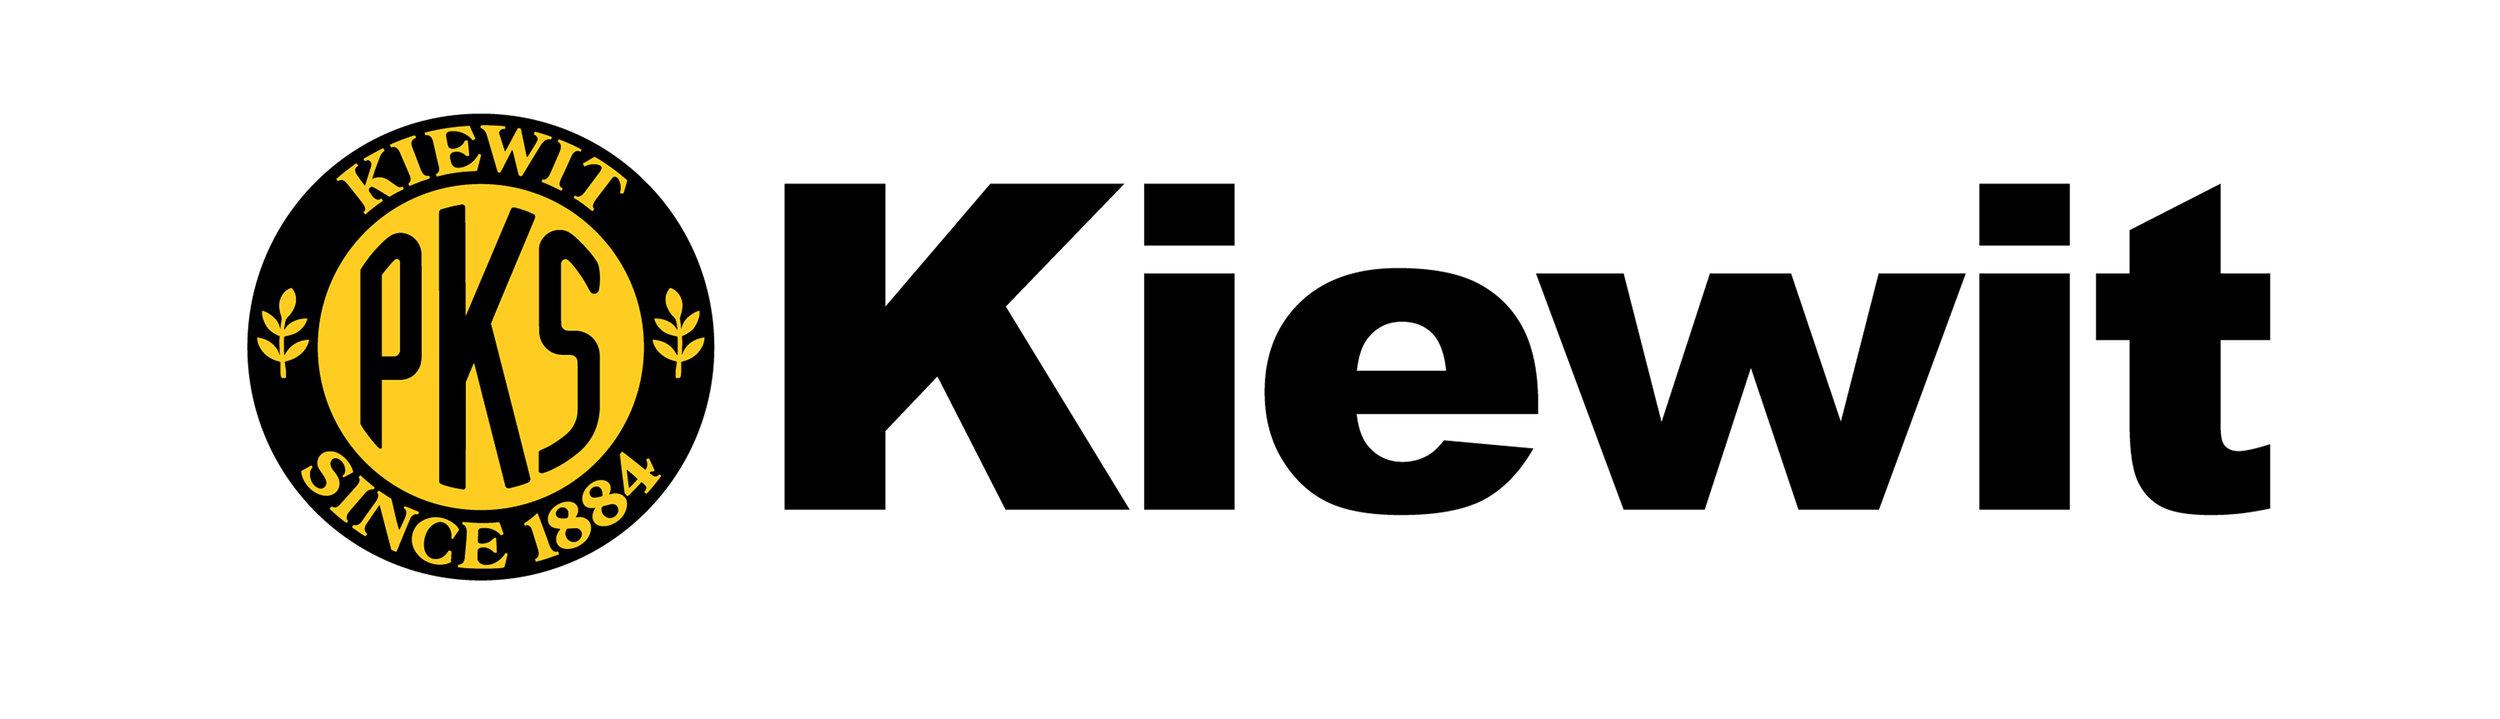 Kiewit-color_300dpi copy.jpg